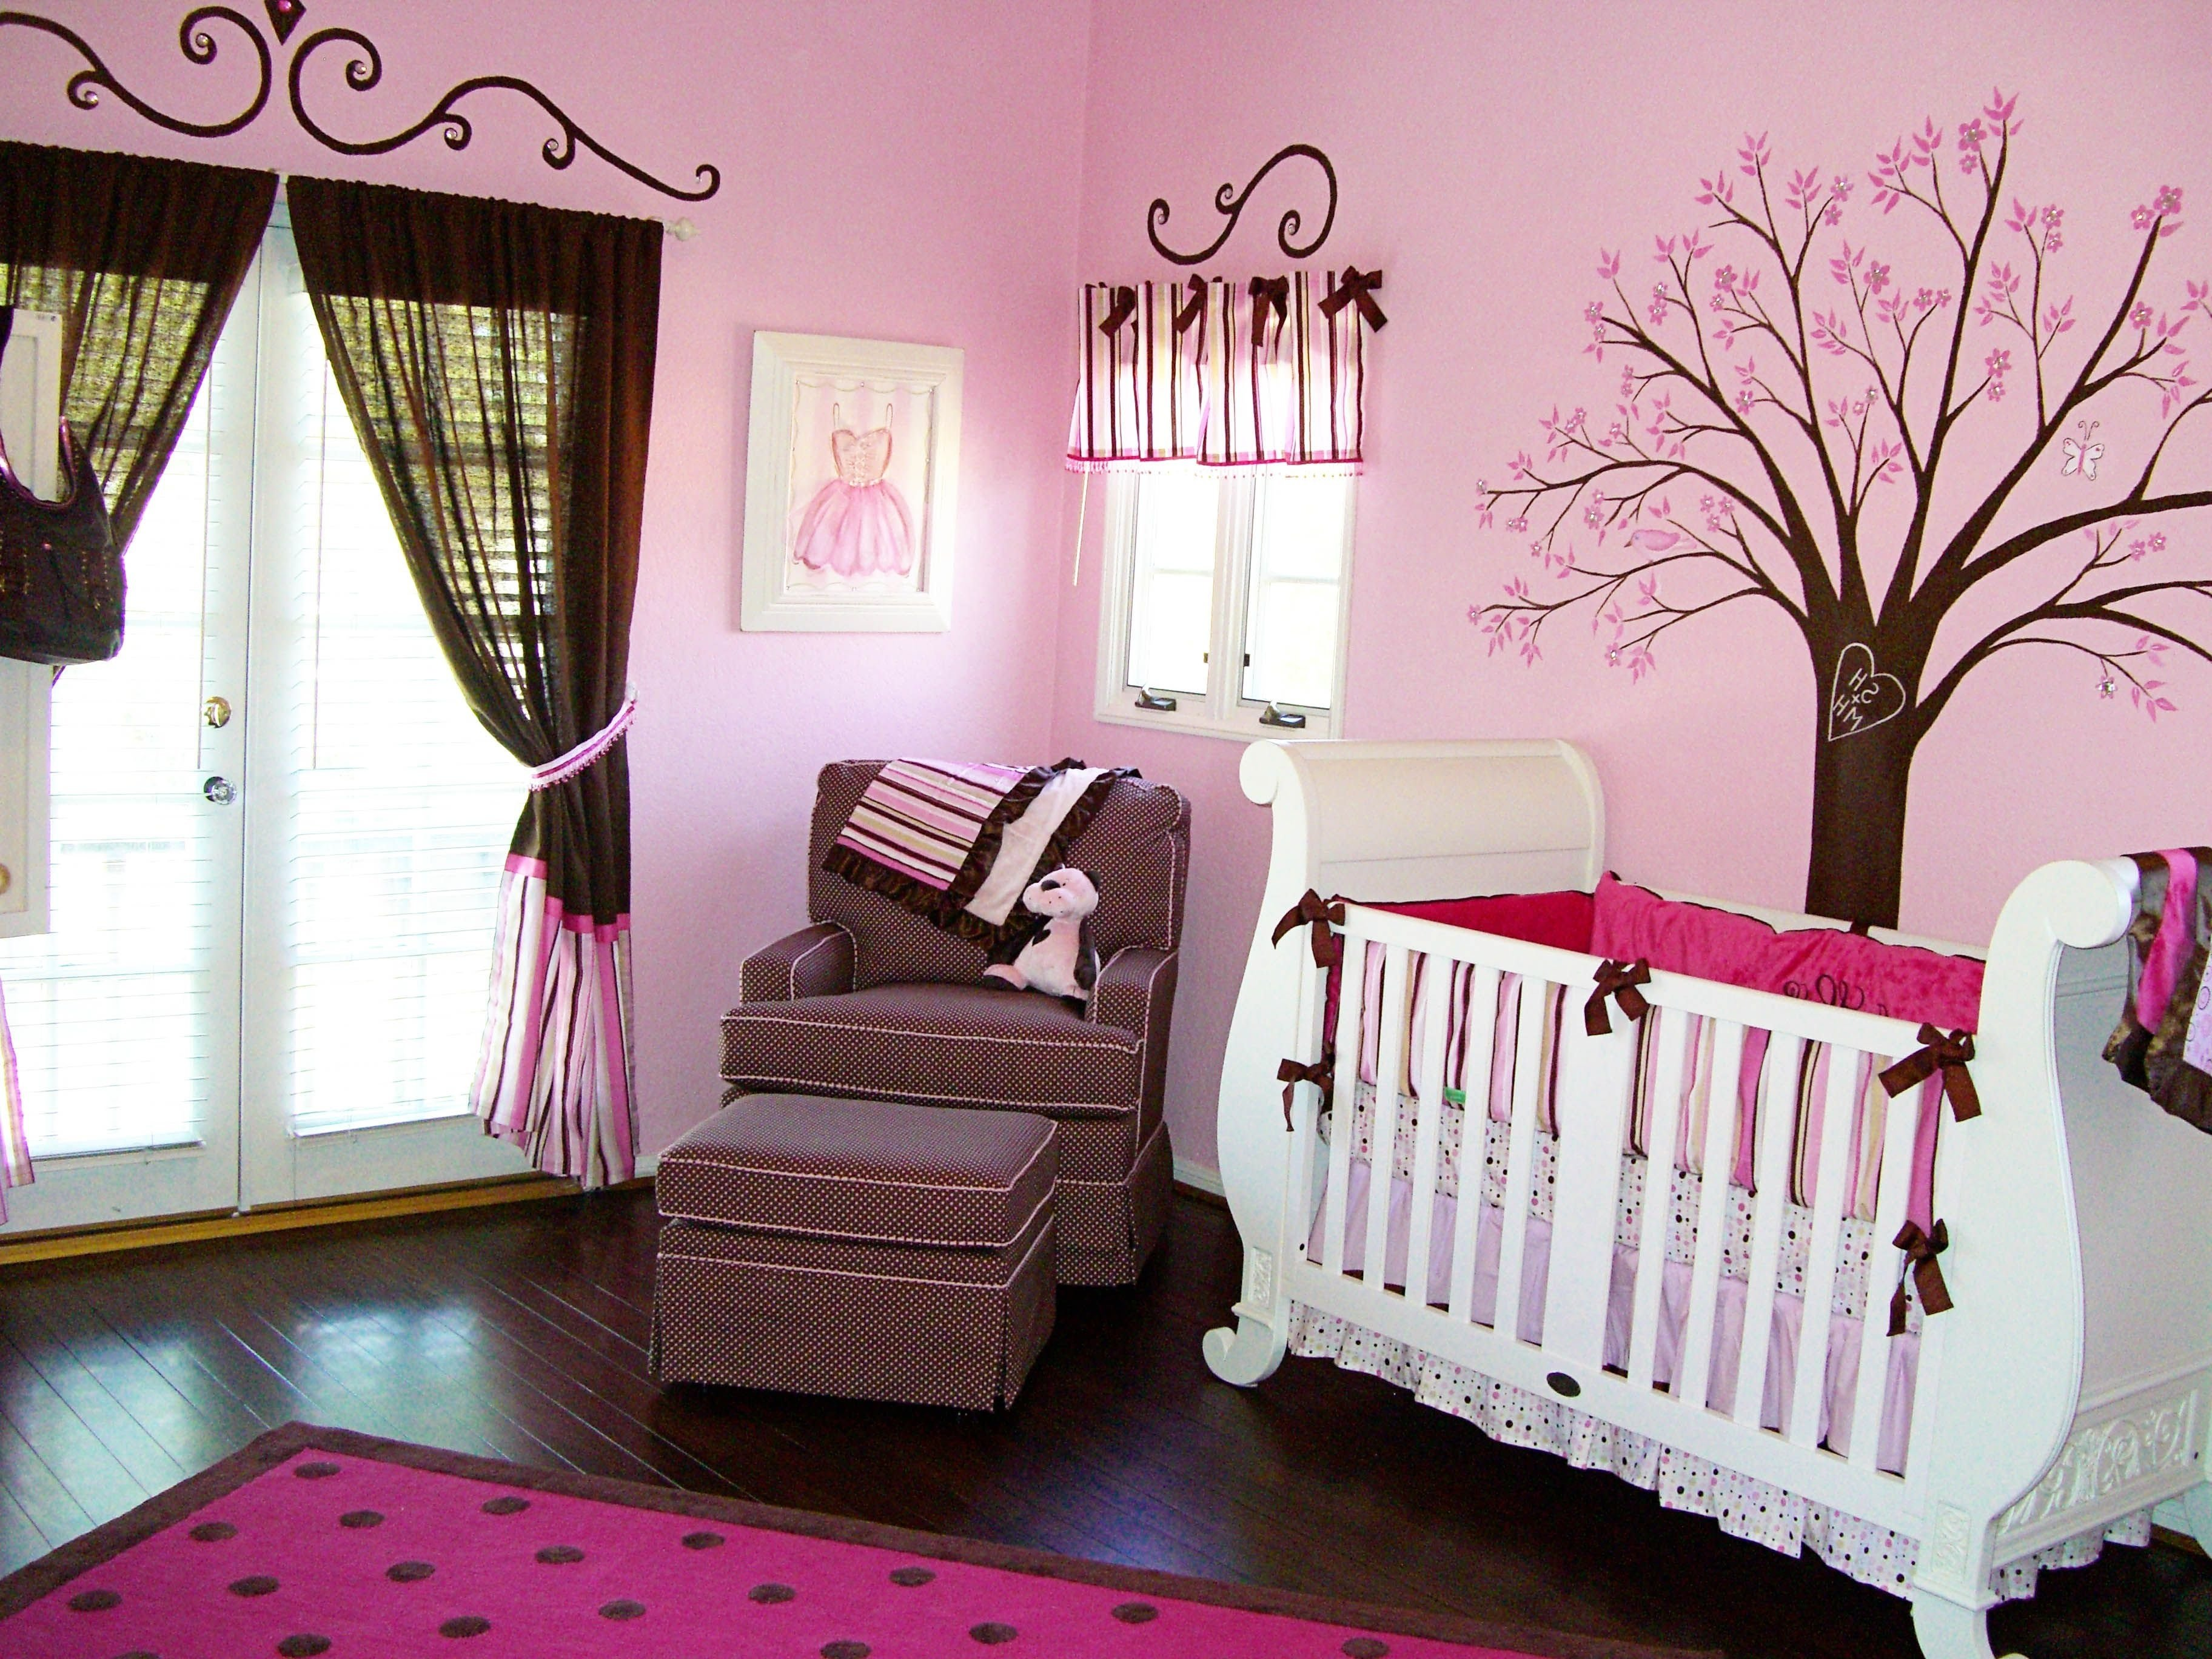 10 Spectacular Baby Nursery Ideas For Girls interior beautiful theme girl baby nursery ideas wooden component 1 2021